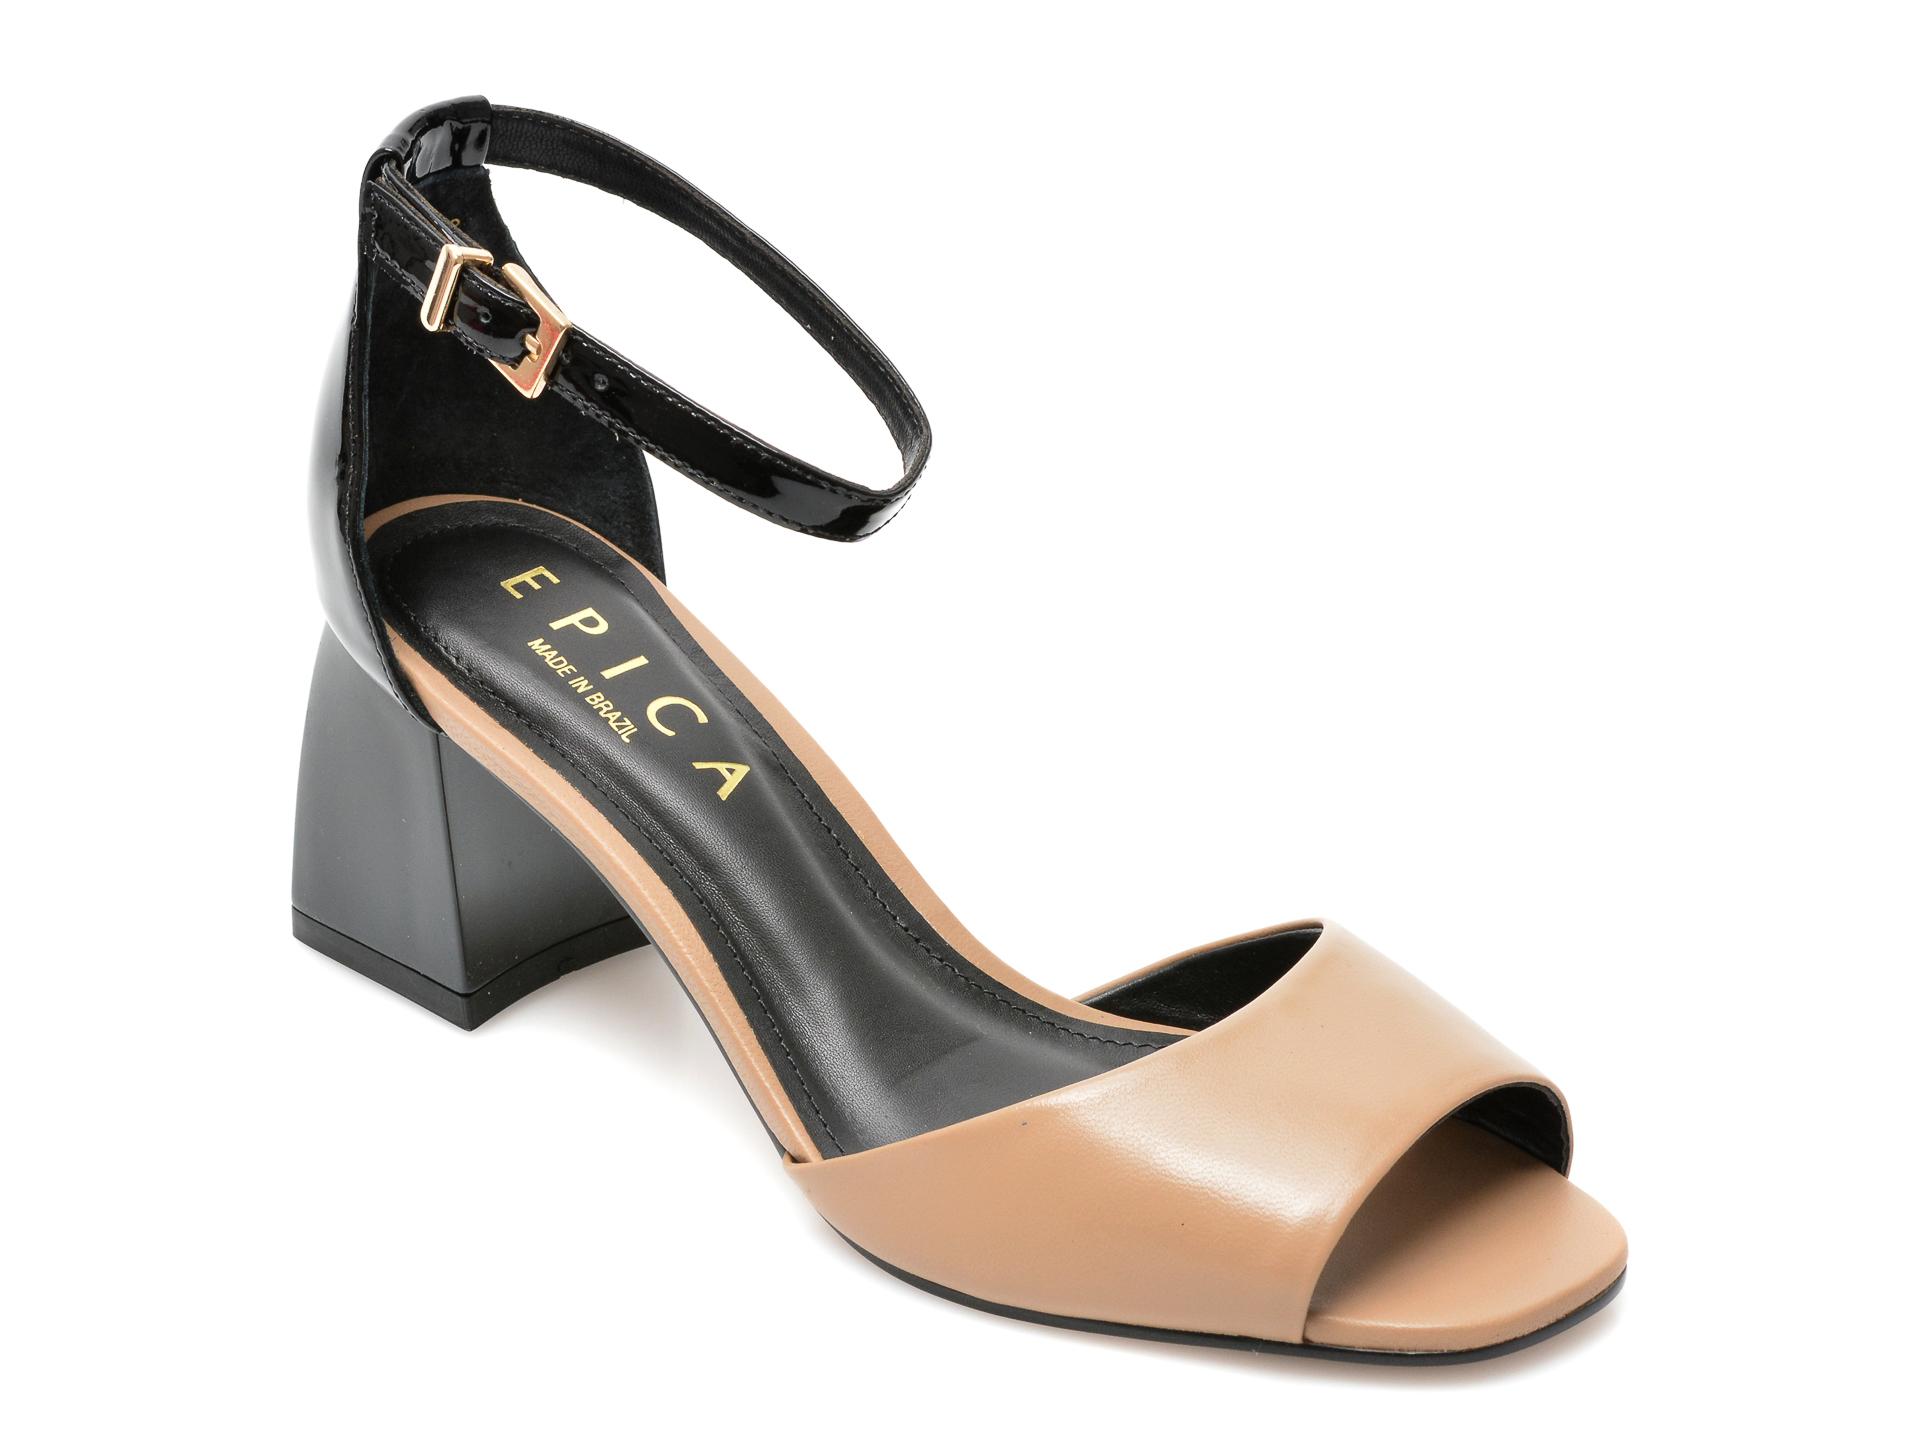 Sandale EPICA bej, 8843623, din piele naturala imagine otter.ro 2021